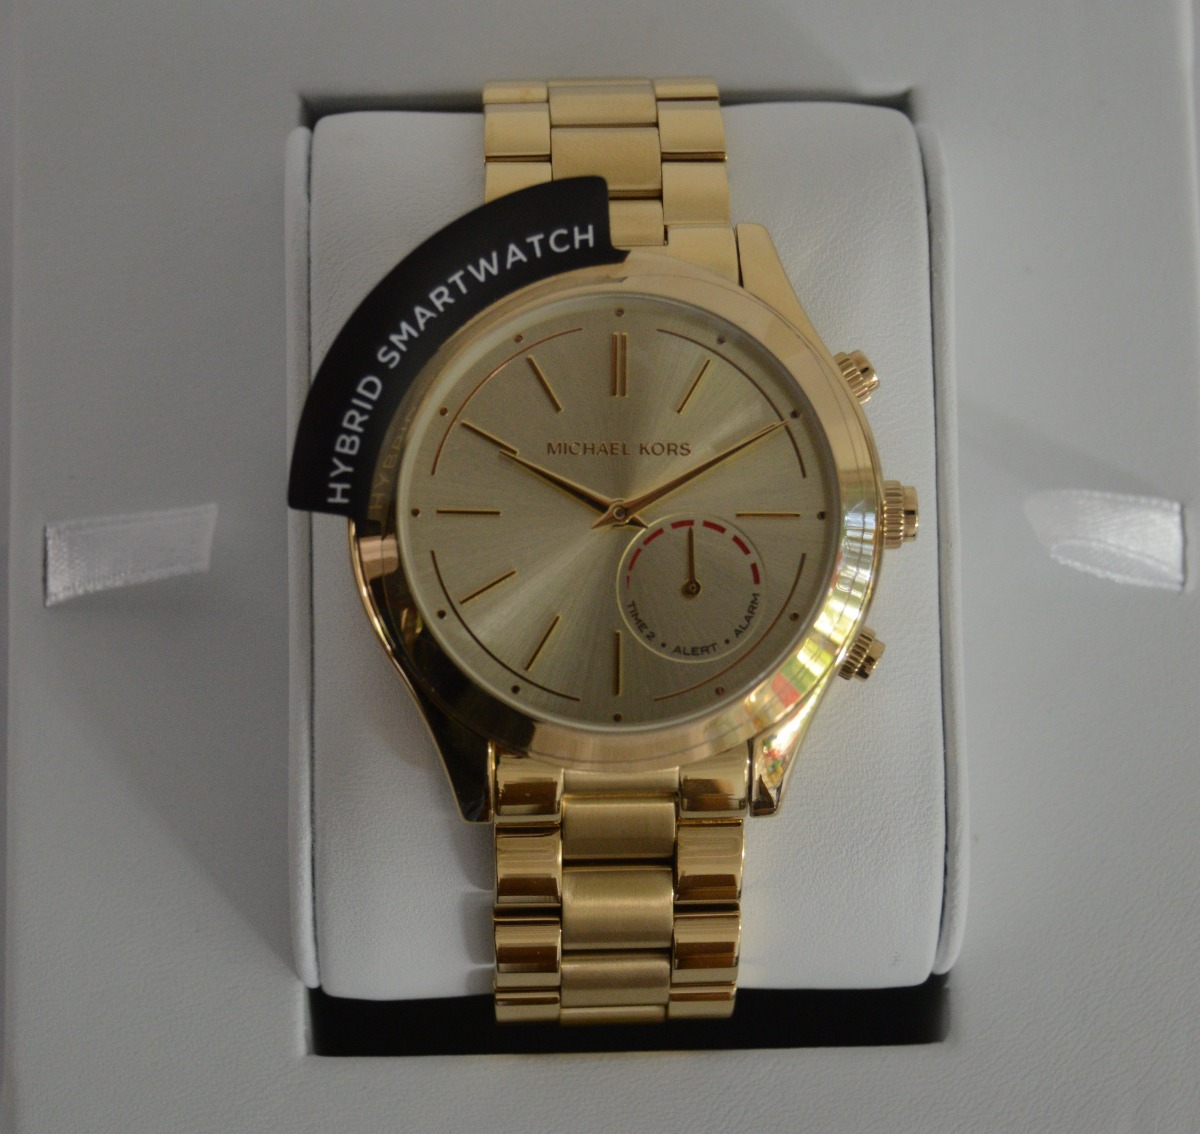 Michael Access Reloj Oro Kors Hibrid Smartwatch c45RSAjL3q